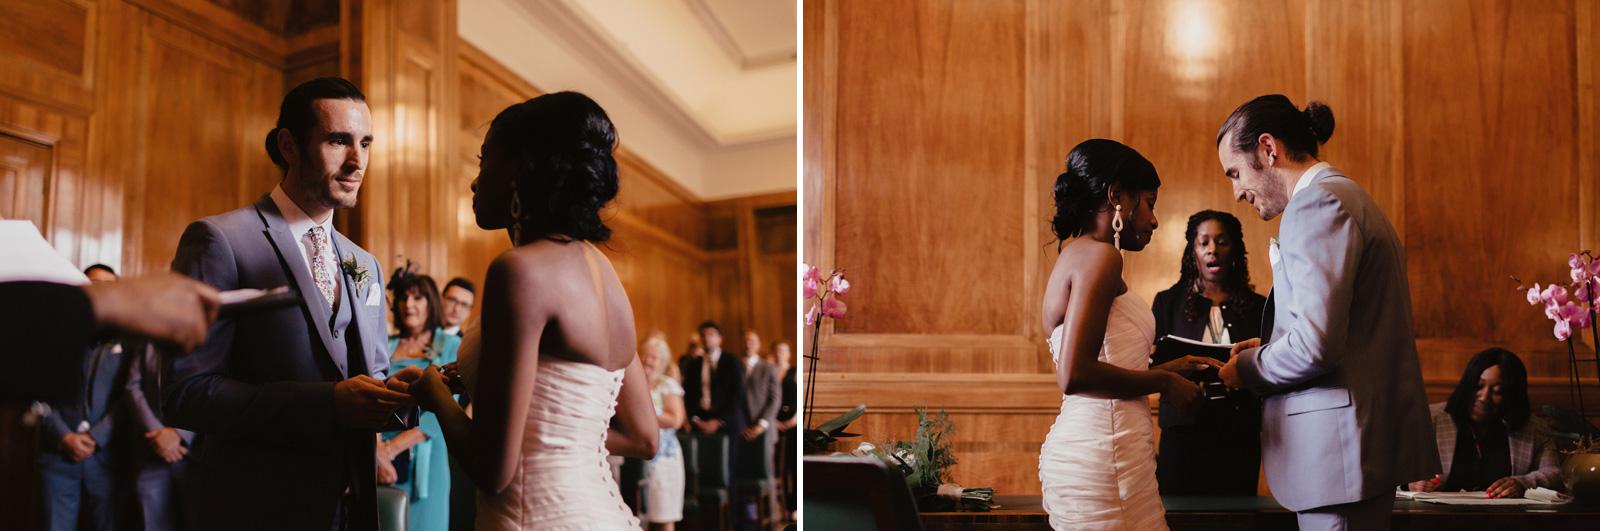 A beautiful wedding at Hackney Town Hall by Essex Wedding Photogapher Chris Bradshaw